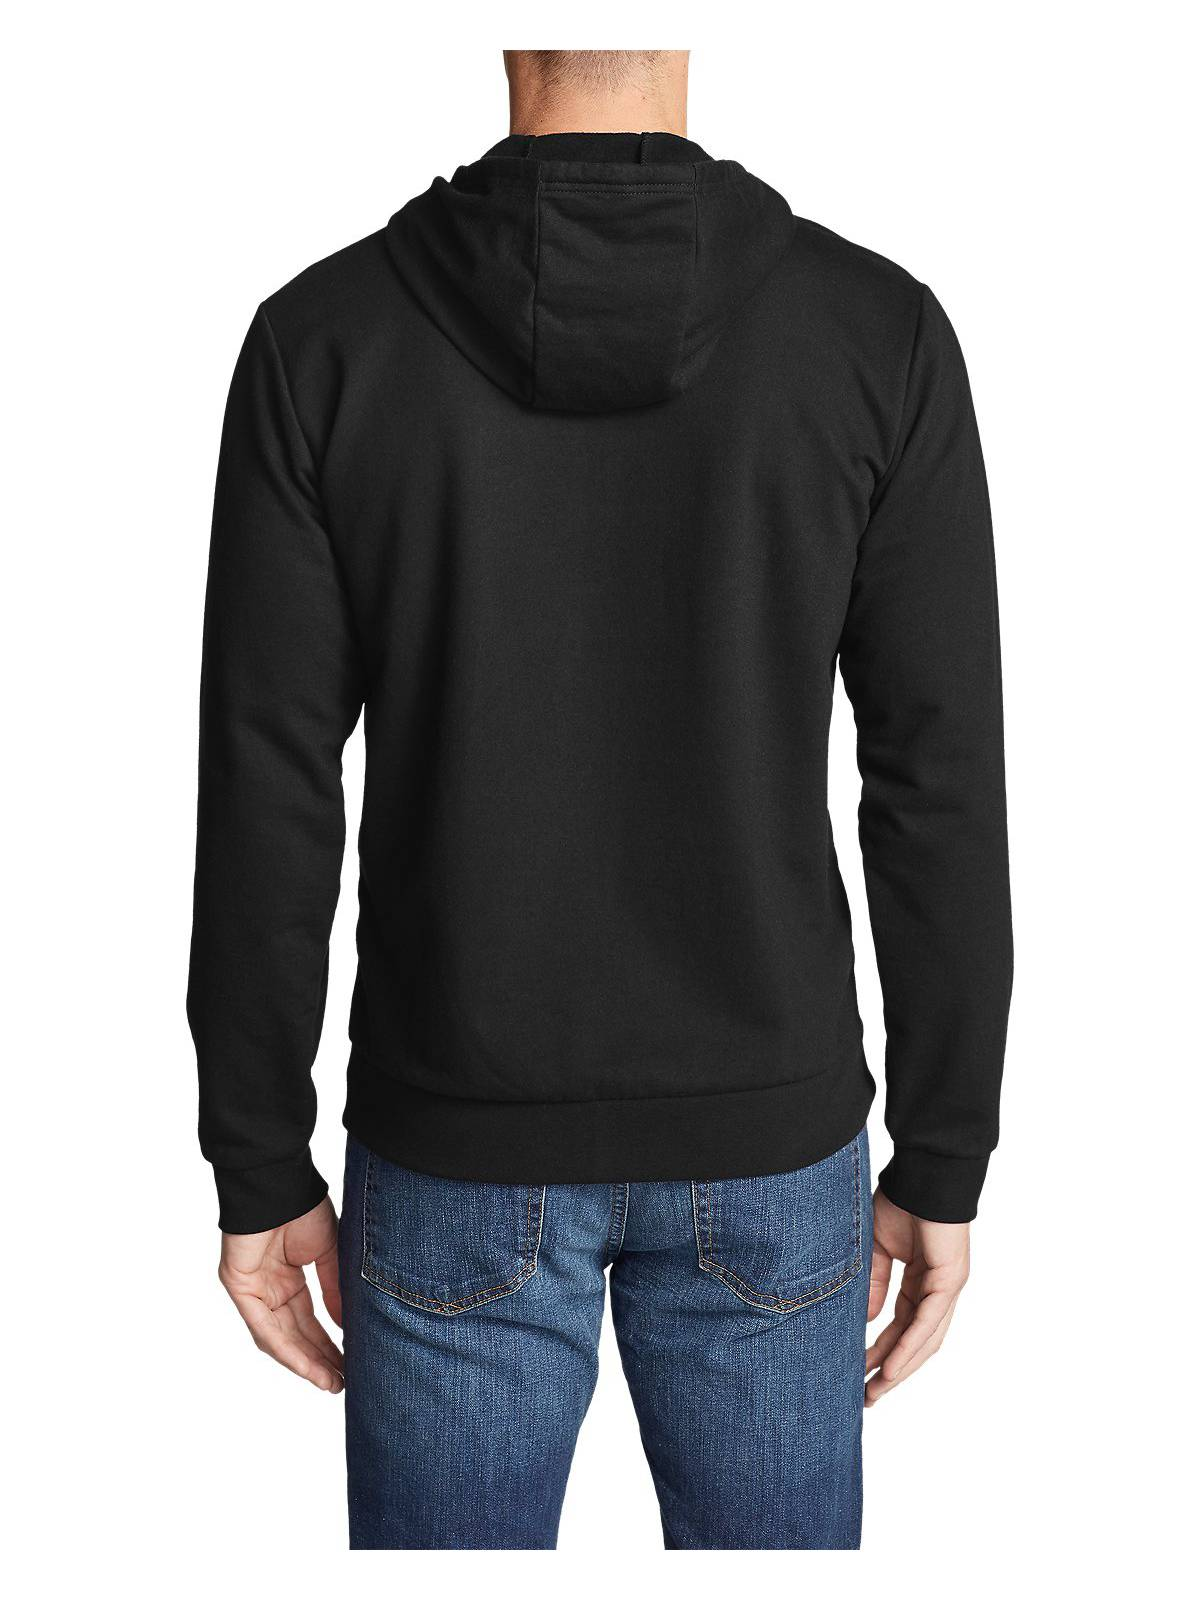 Eddie-Bauer-Men-039-s-Camp-Fleece-Full-Zip-Hoodie thumbnail 3